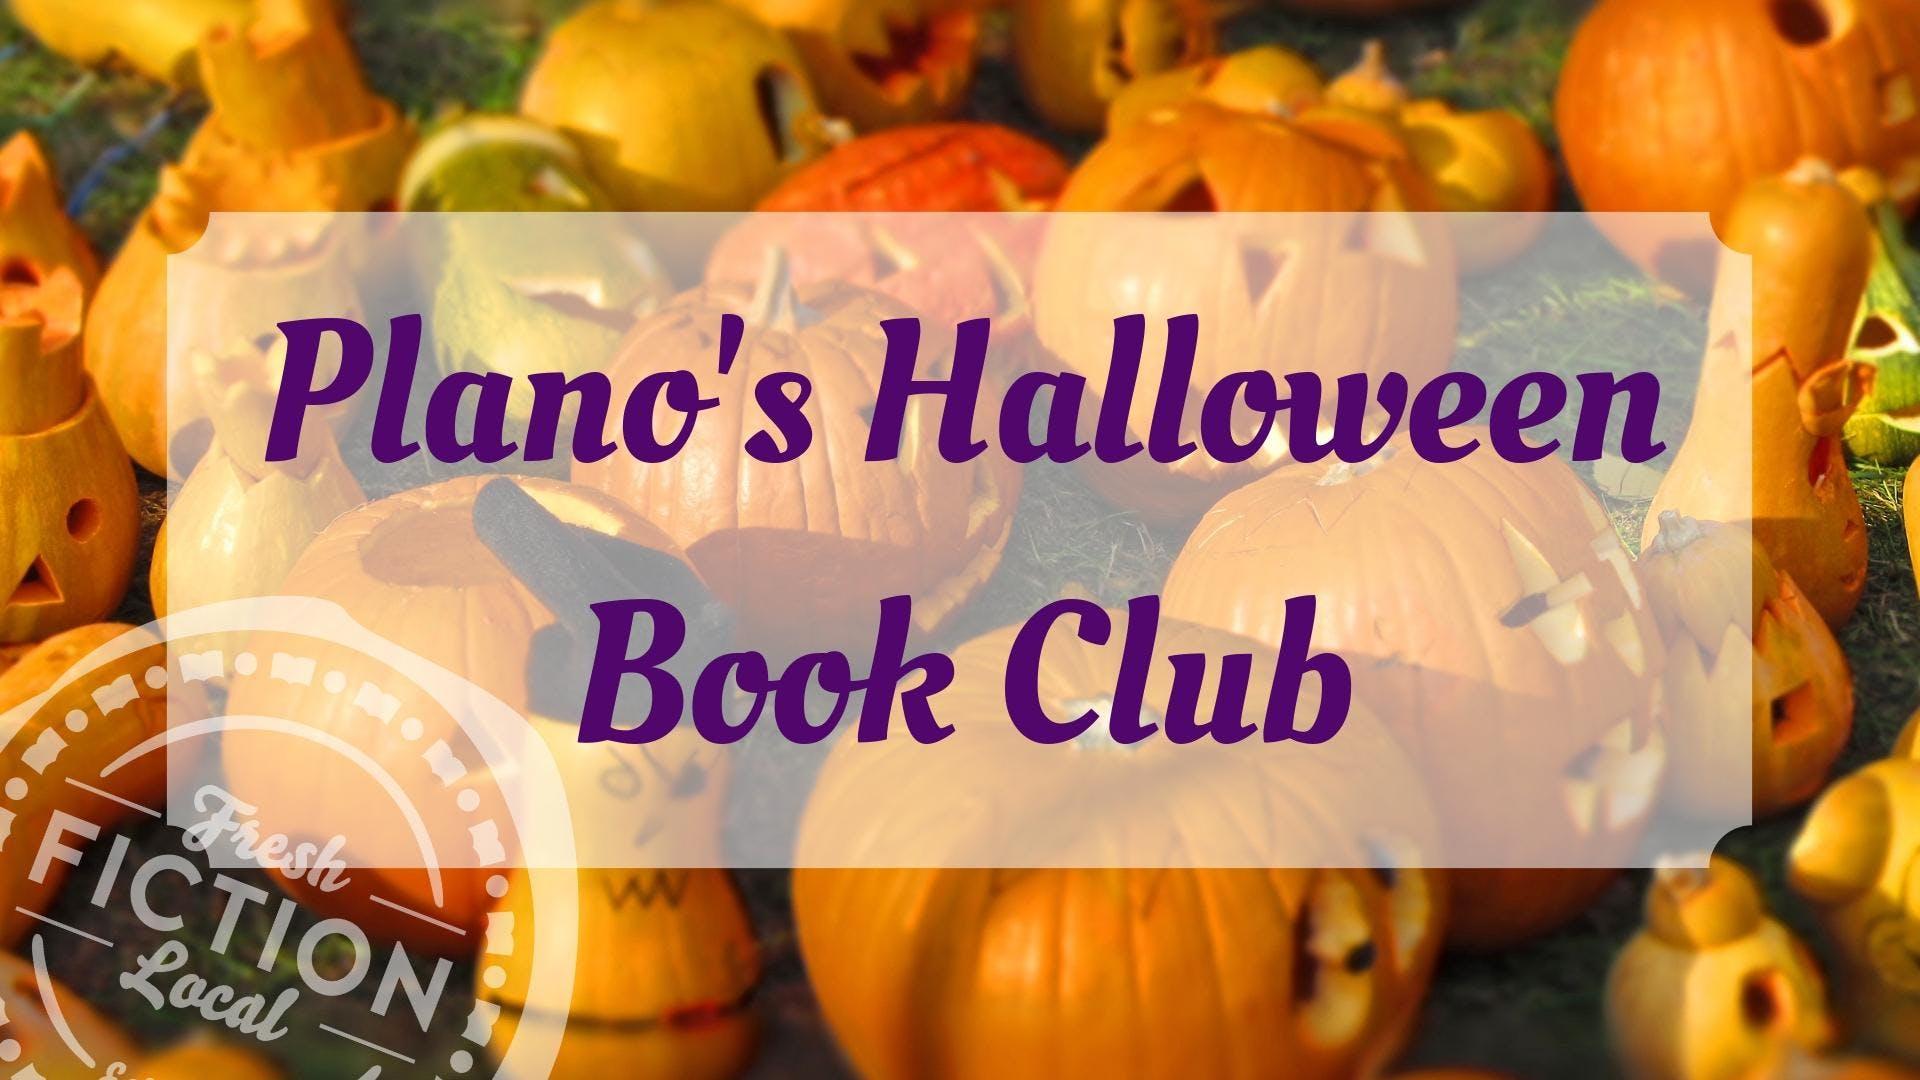 Plano's Halloween Book Club with Jennifer Est